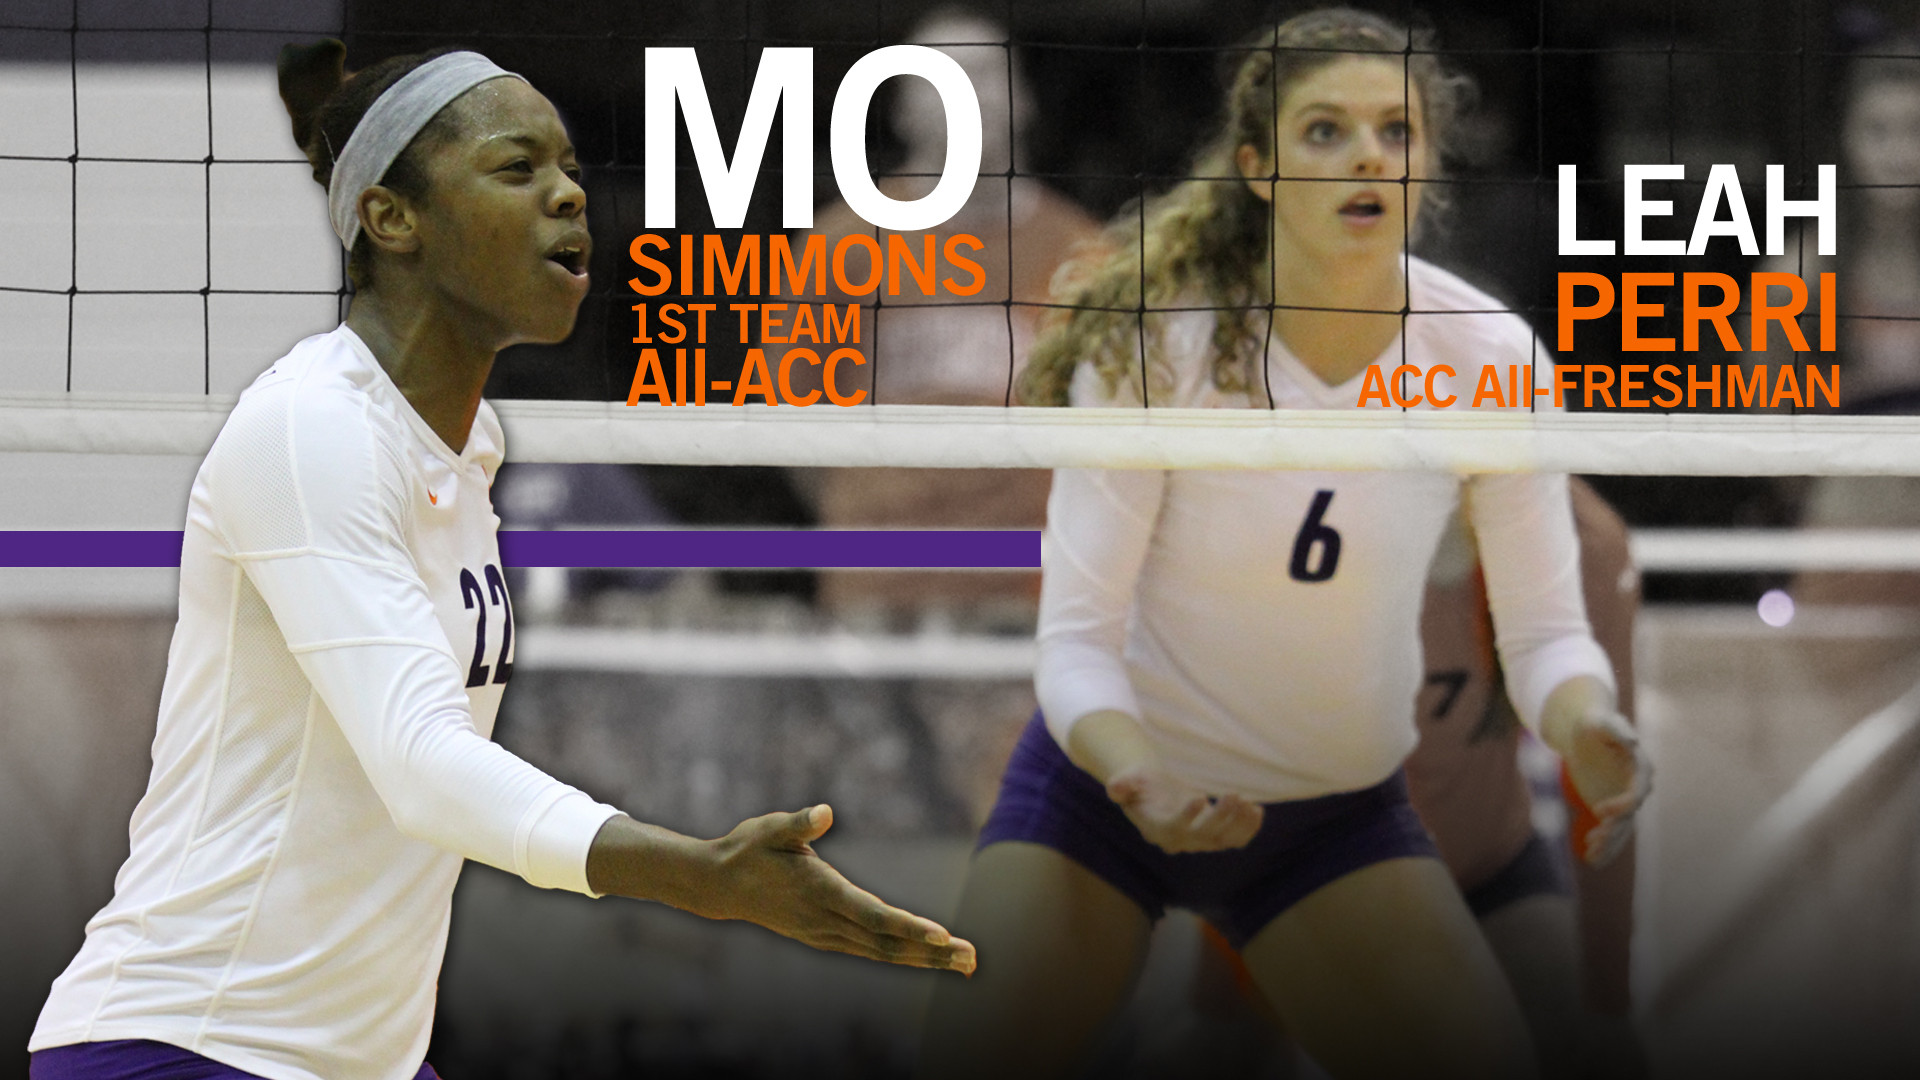 @ClemsonVB: Simmons Named to All-ACC 1st Team; Perri All-Freshman